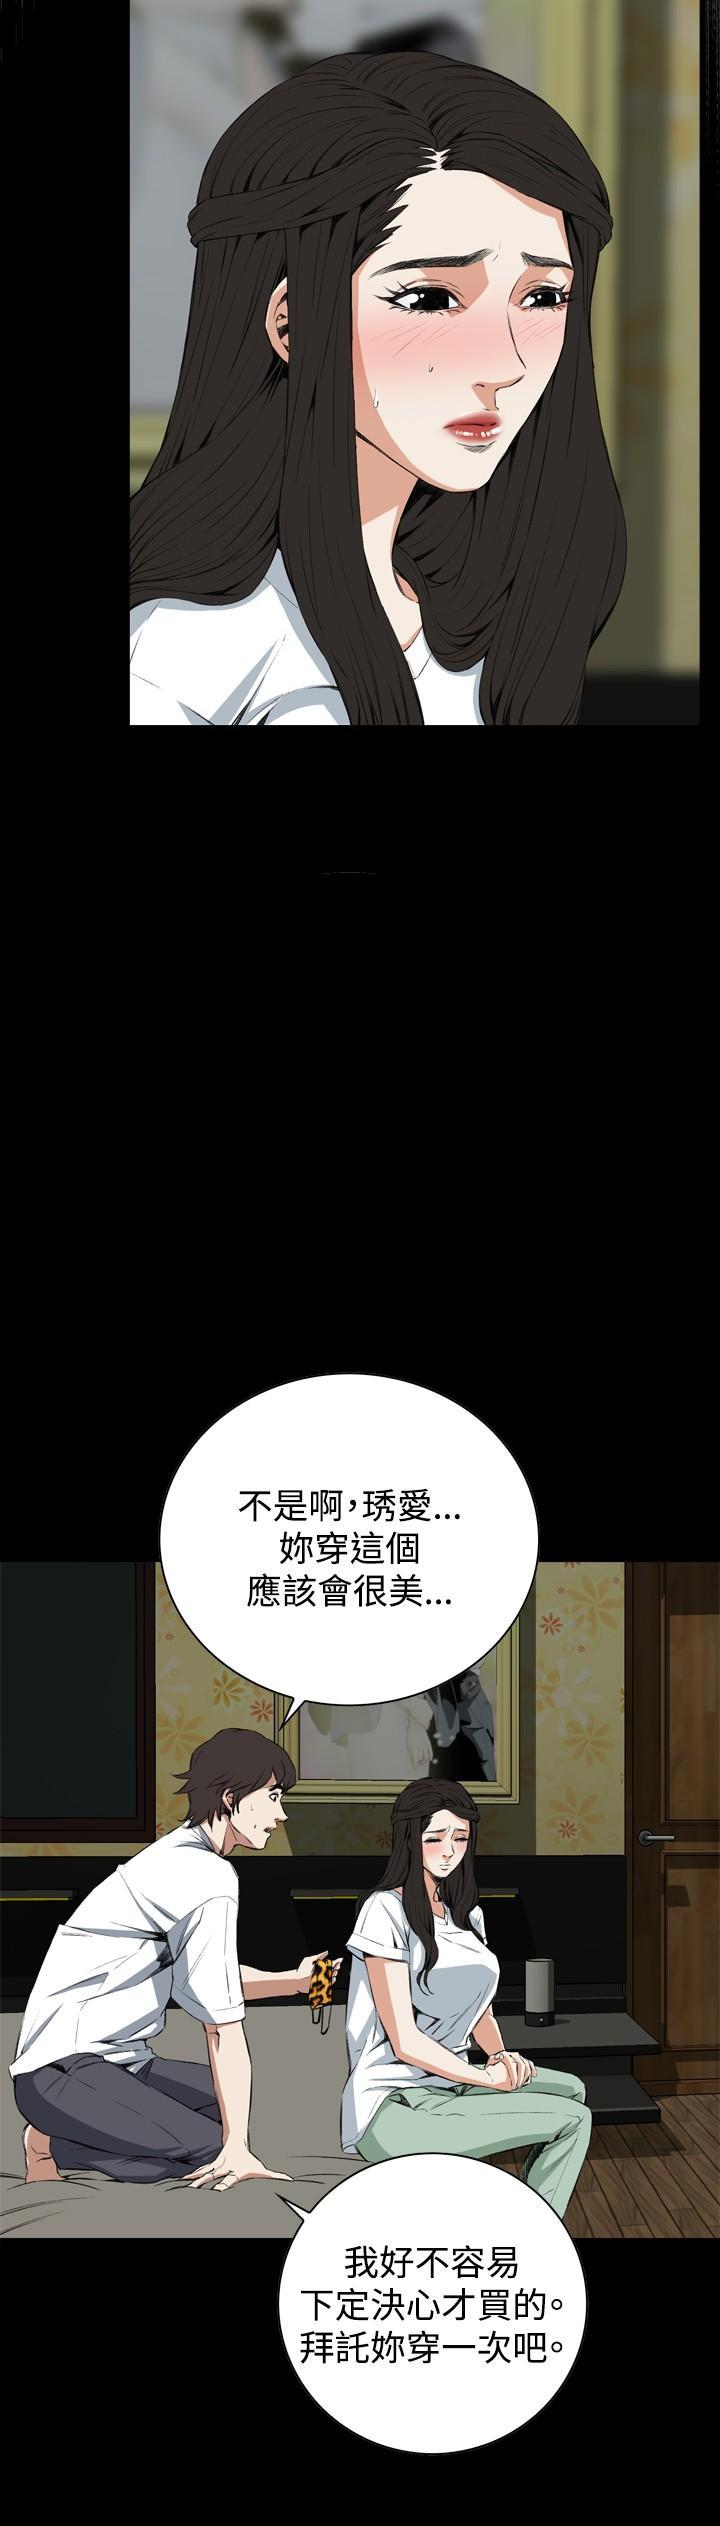 Take a Peek 偷窥 Ch.39~55 [Chinese]中文 392